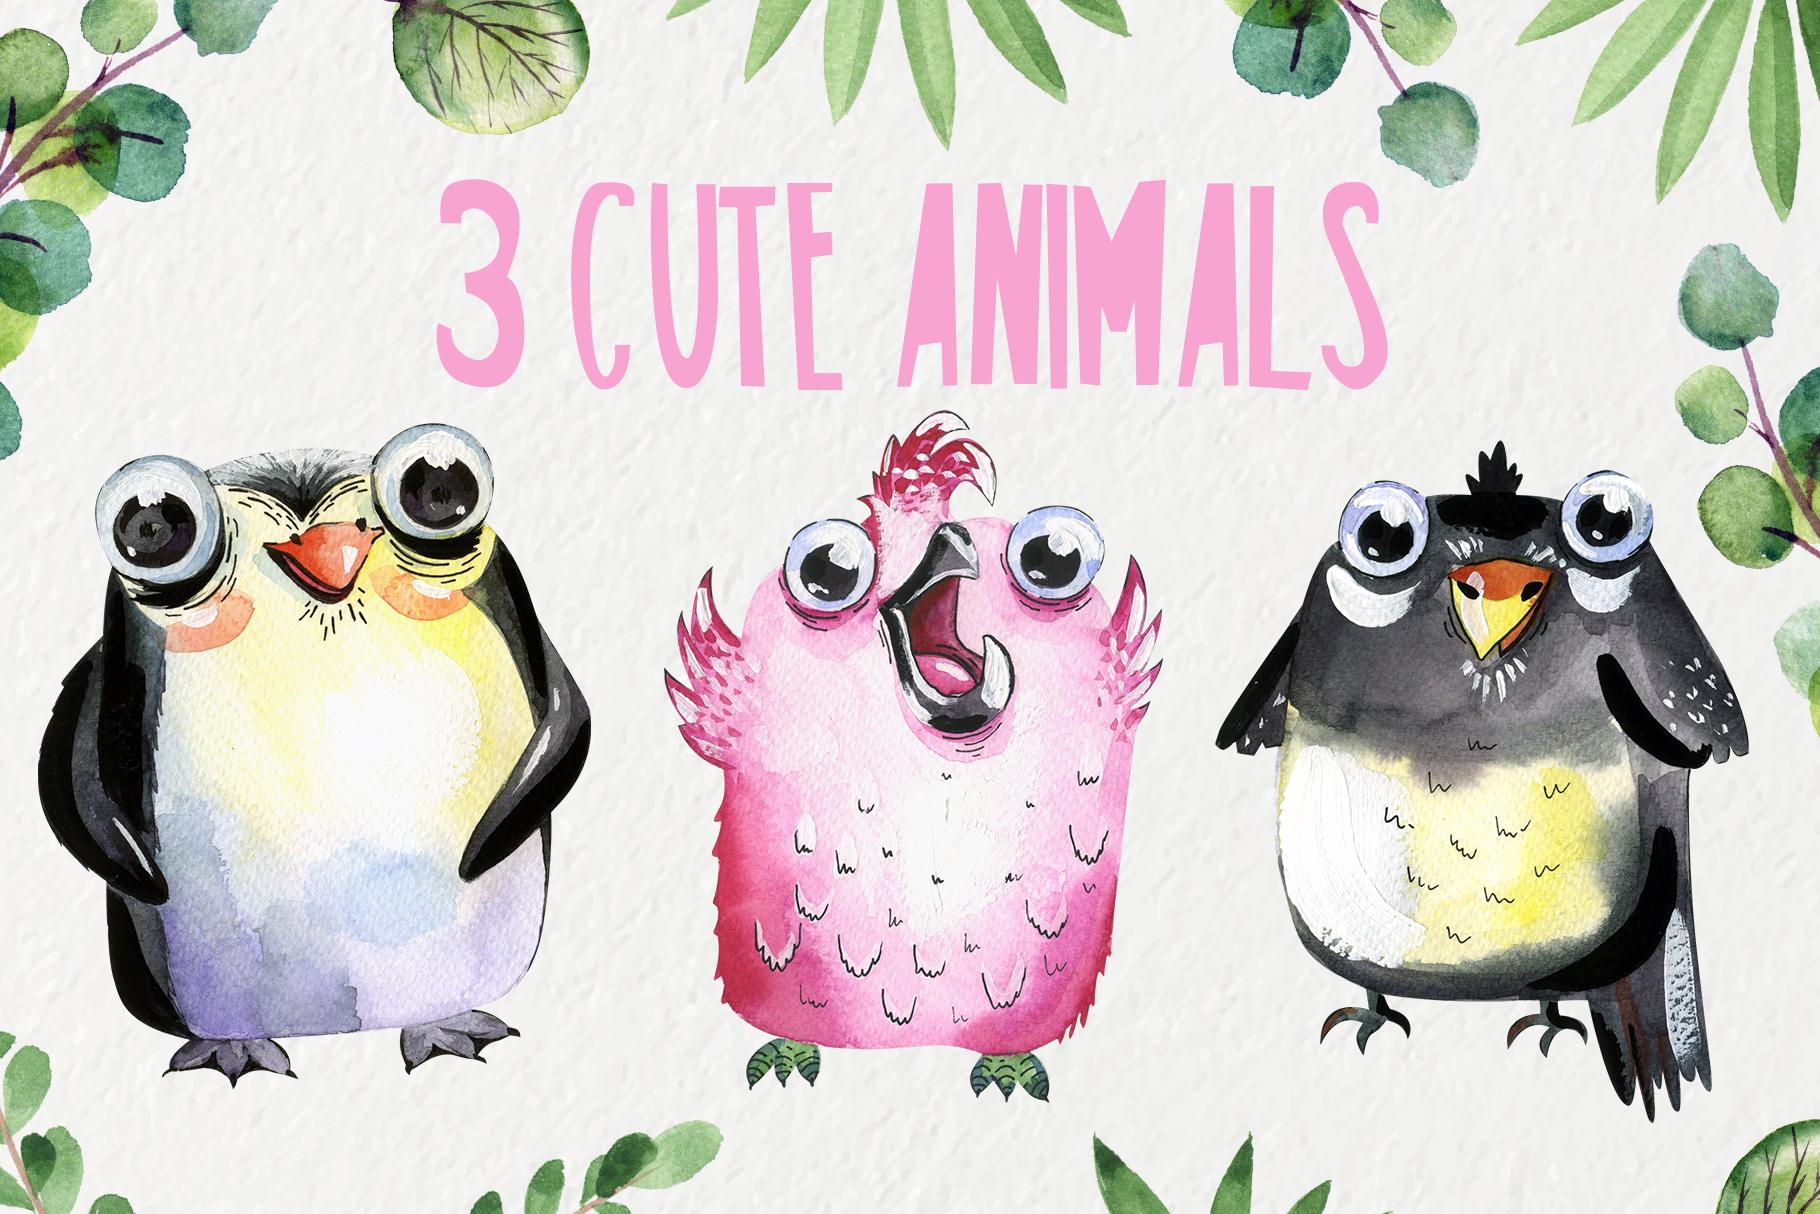 3 Cute animals example image 1